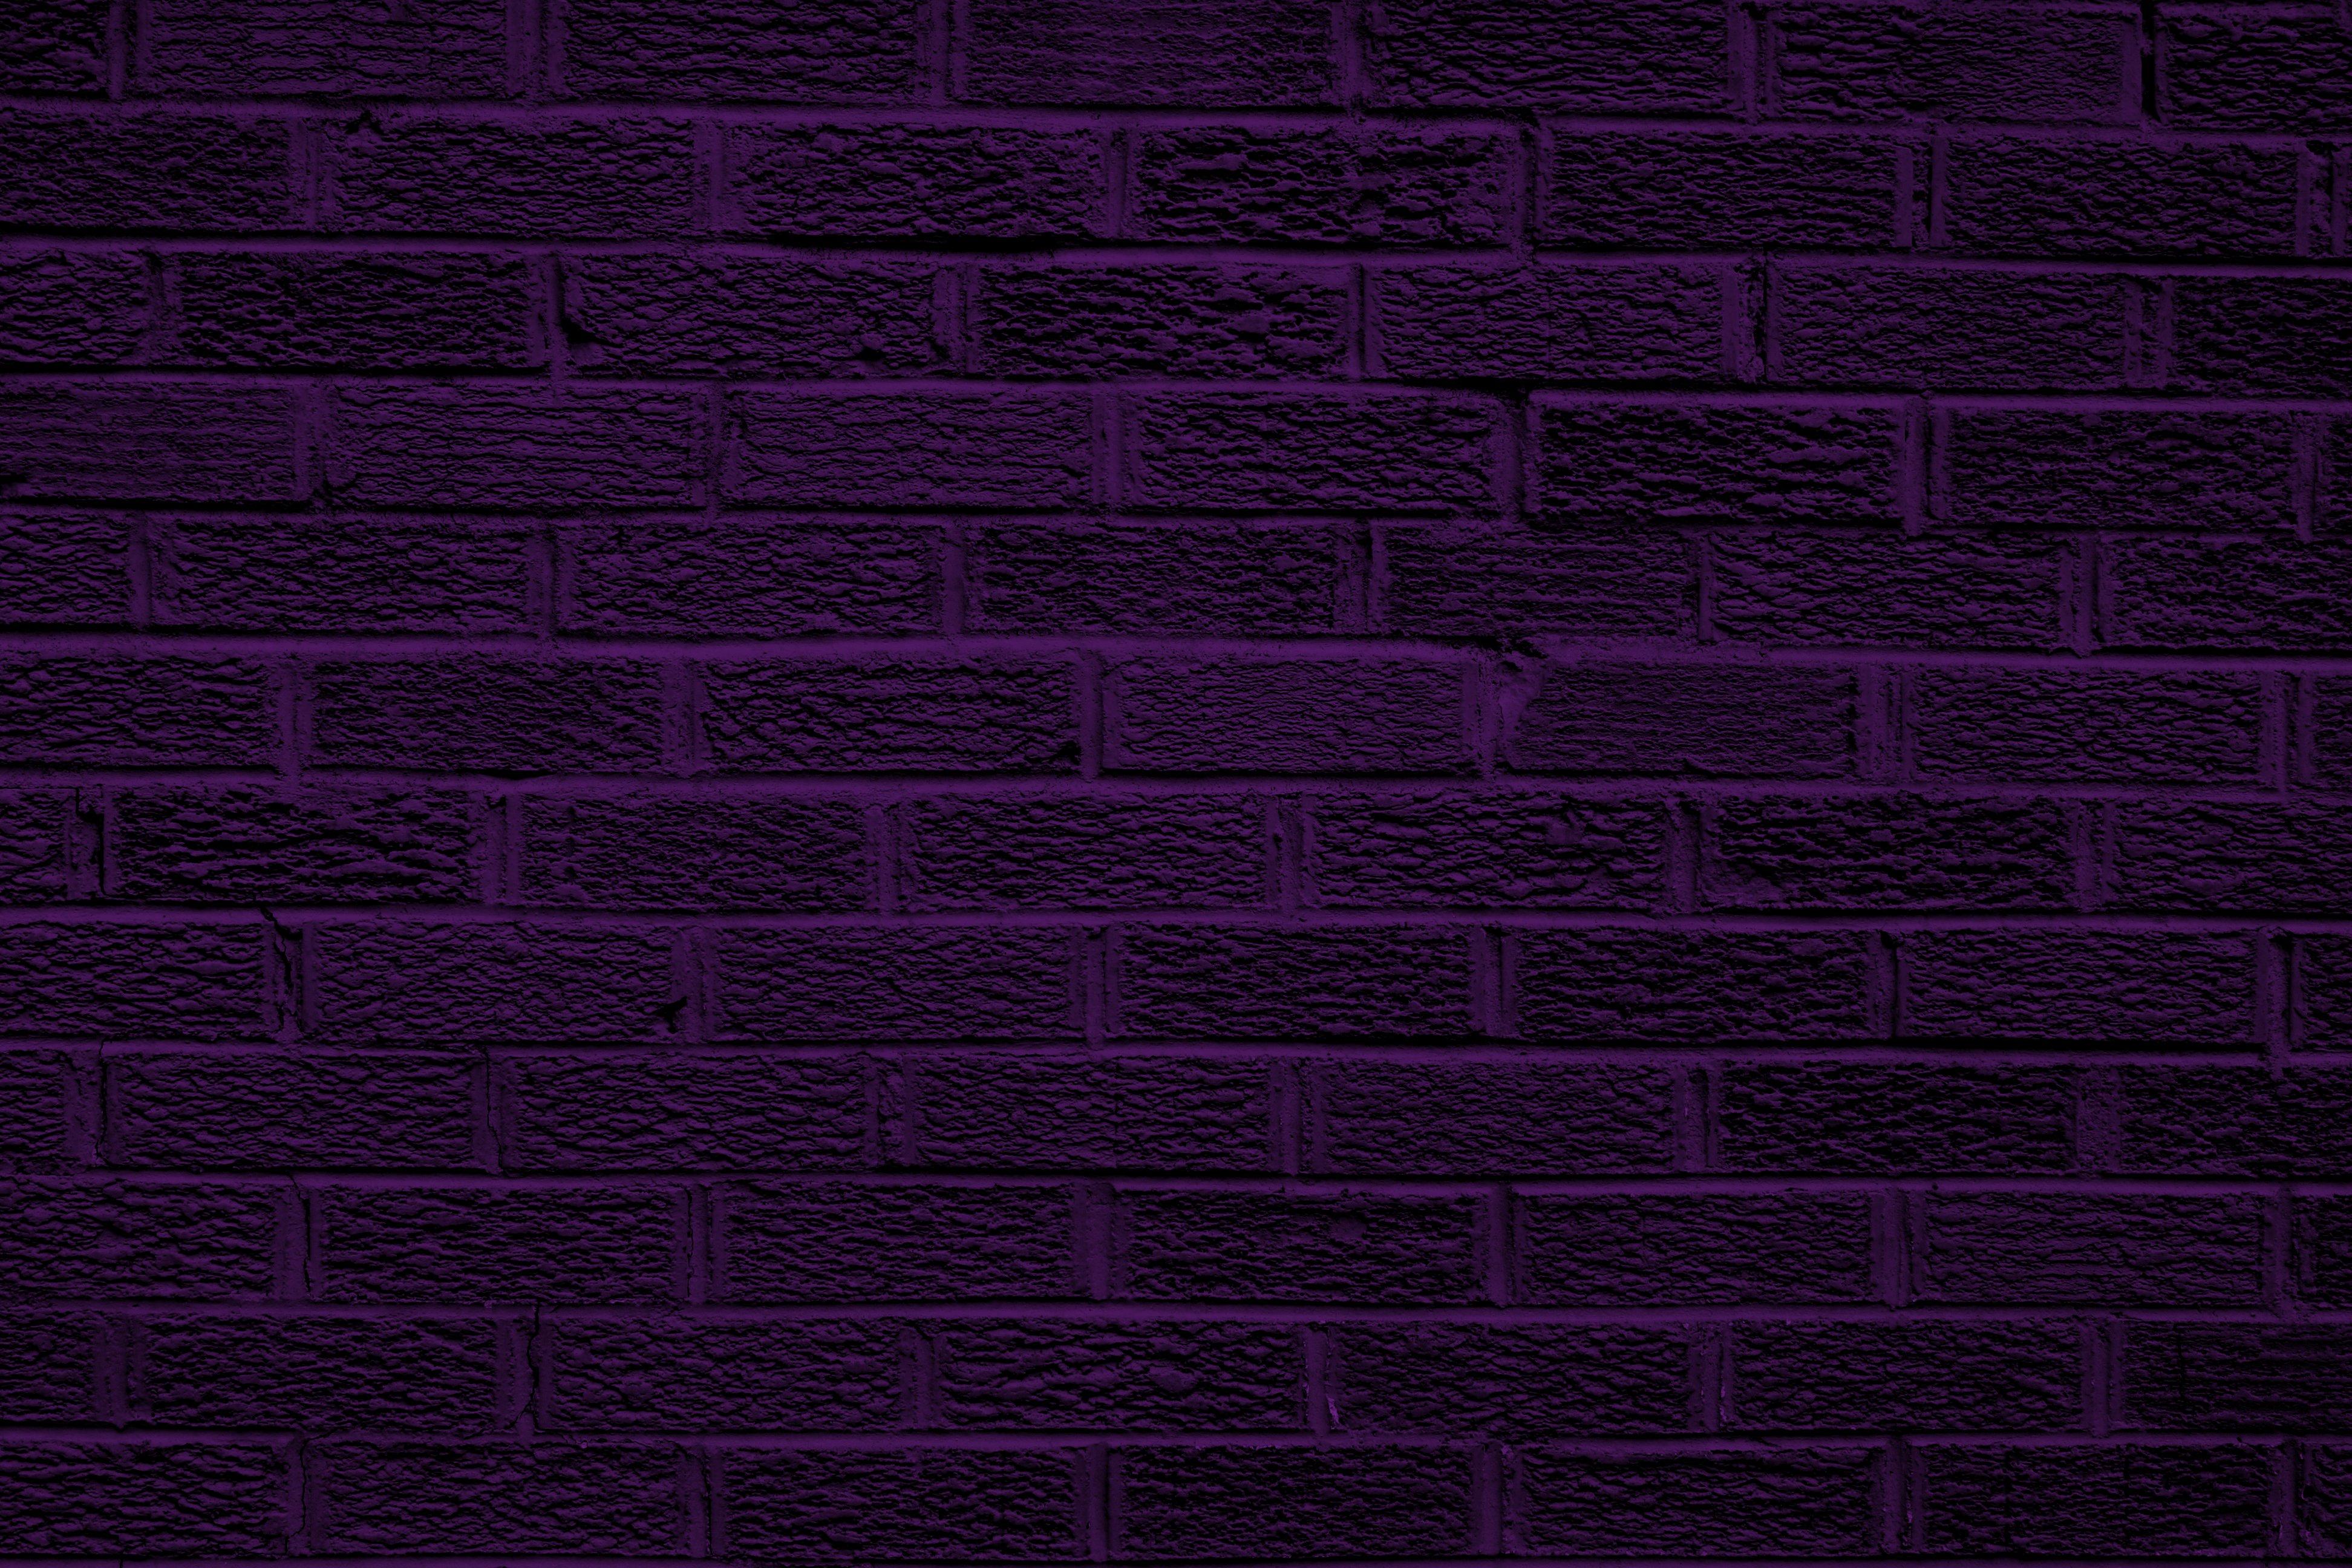 purple brick wallpaper 2015   Grasscloth Wallpaper 3888x2592